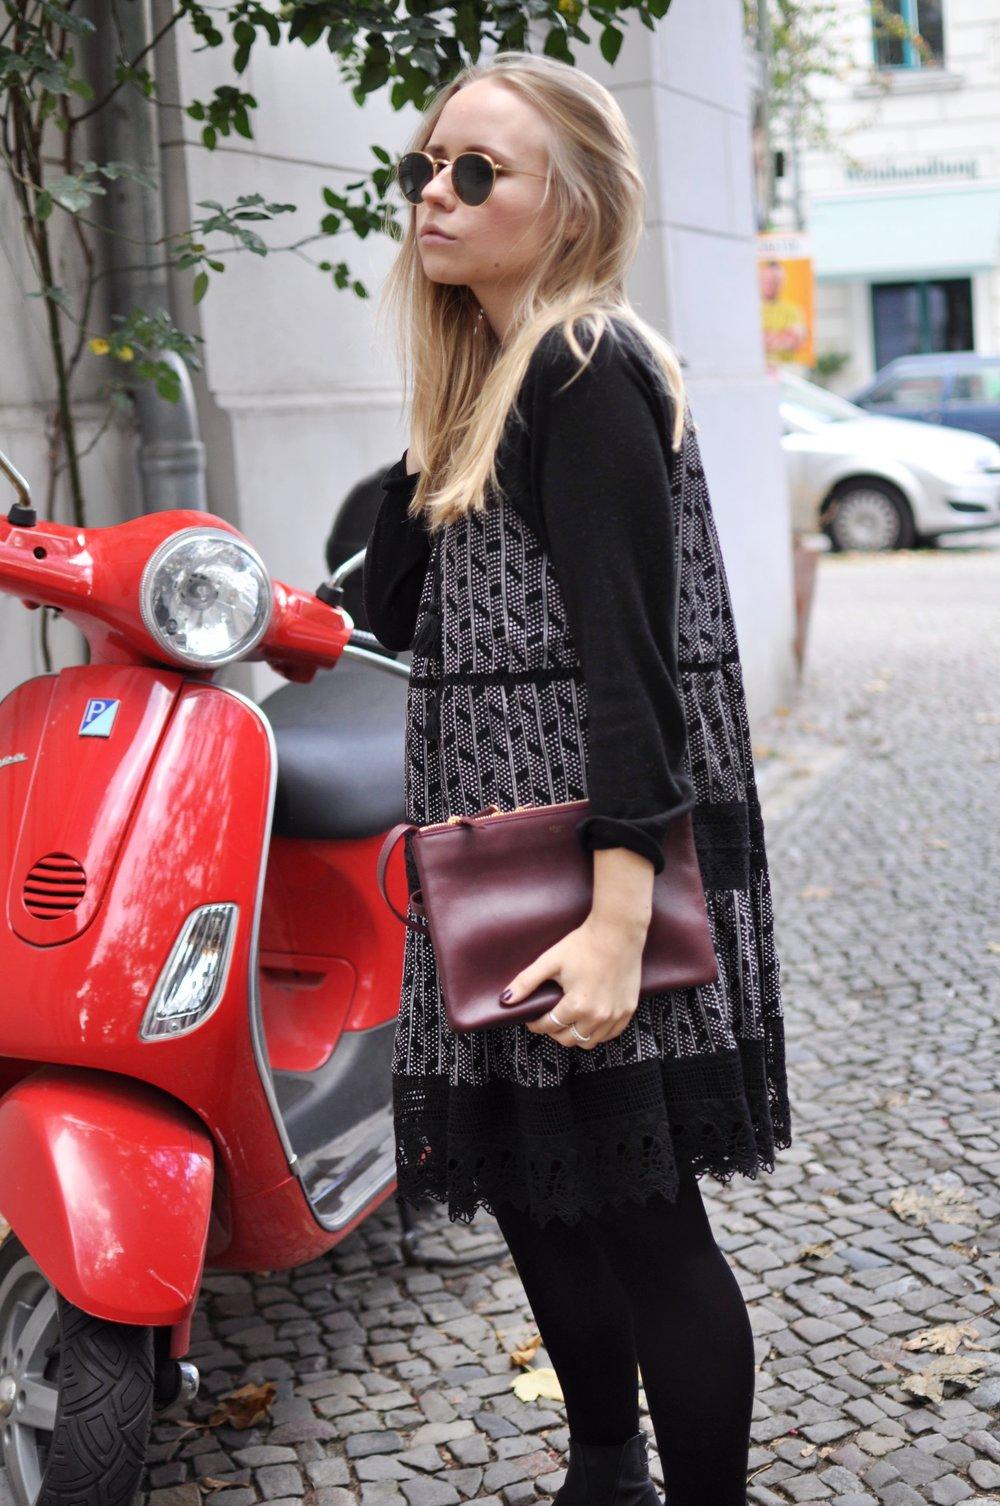 Fashionblogger-Berlin-Kleid-ueber-Pullover-Trend